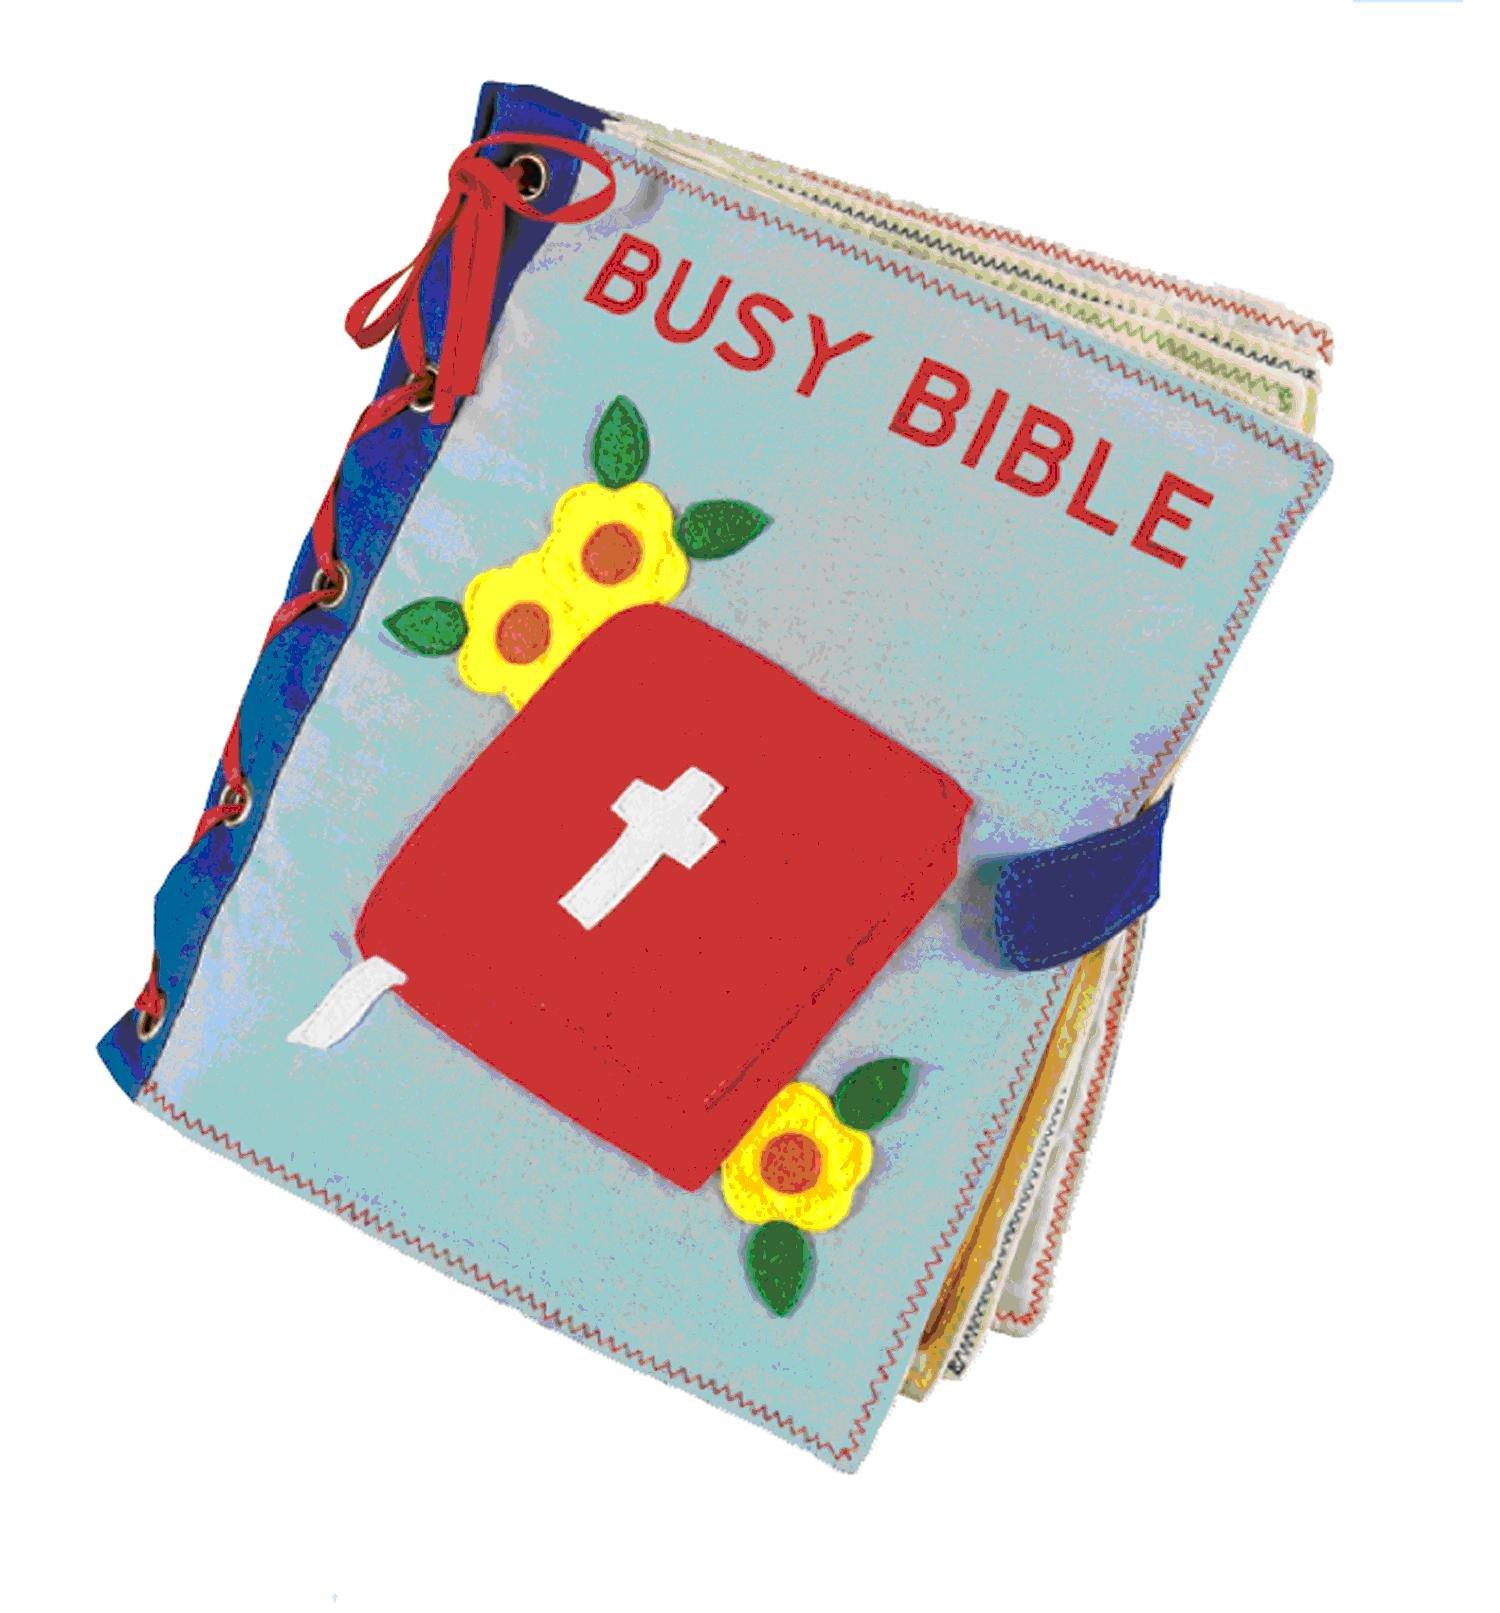 The Busy Bible Bob Starks 9780971202207 Amazon Com Books